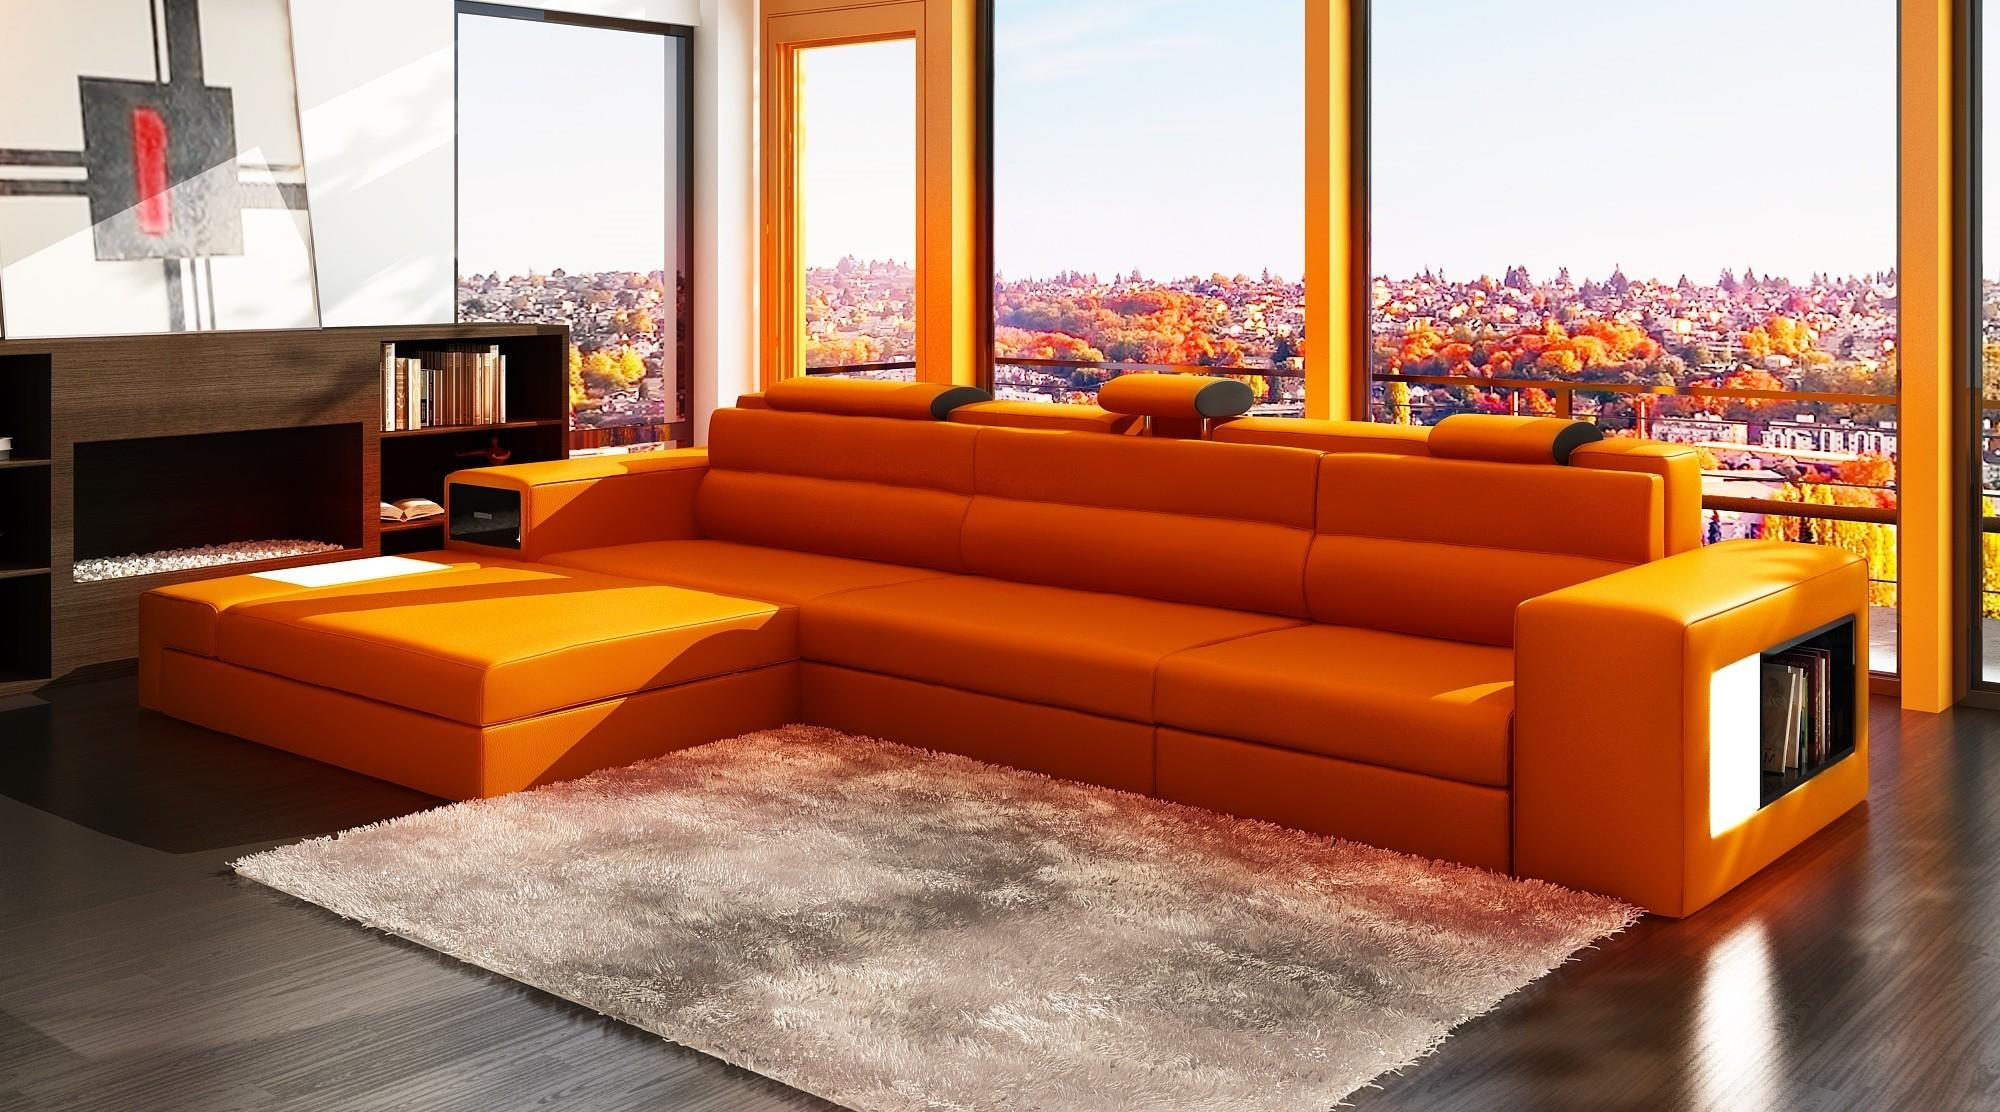 Orange Leather Sofa | Tehranmix Decoration With Regard To Burnt Orange Leather Sofas (Image 6 of 20)